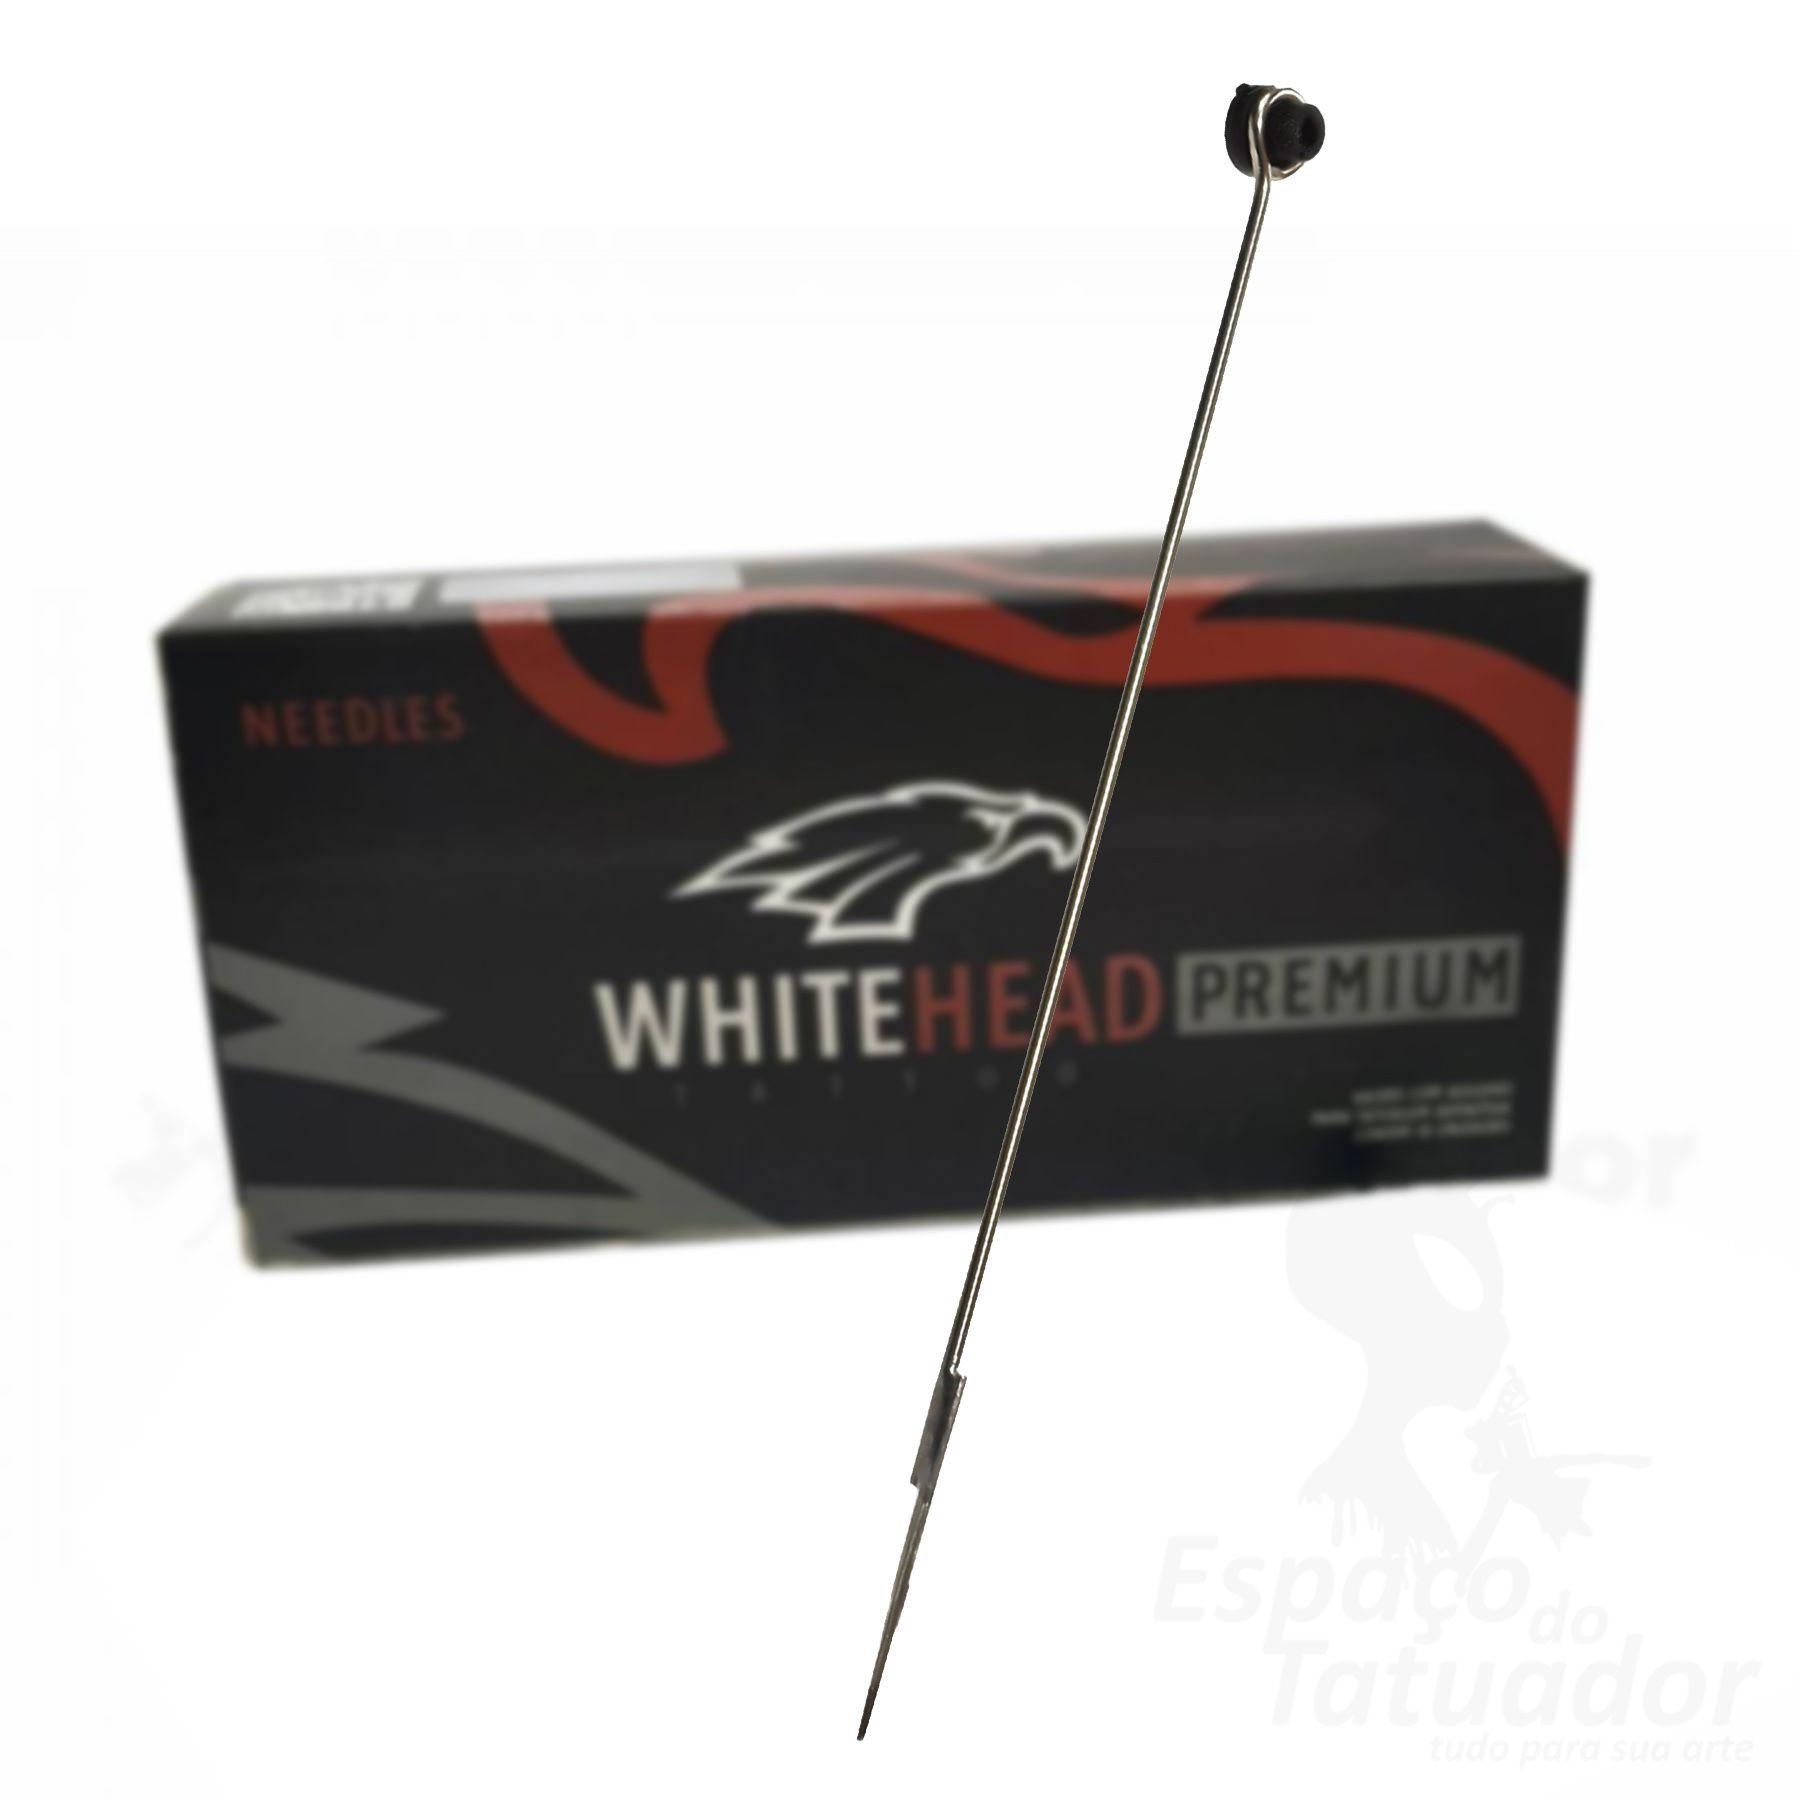 Agulha White Head Premium - RL 1205 - Caixa com 50 unidades